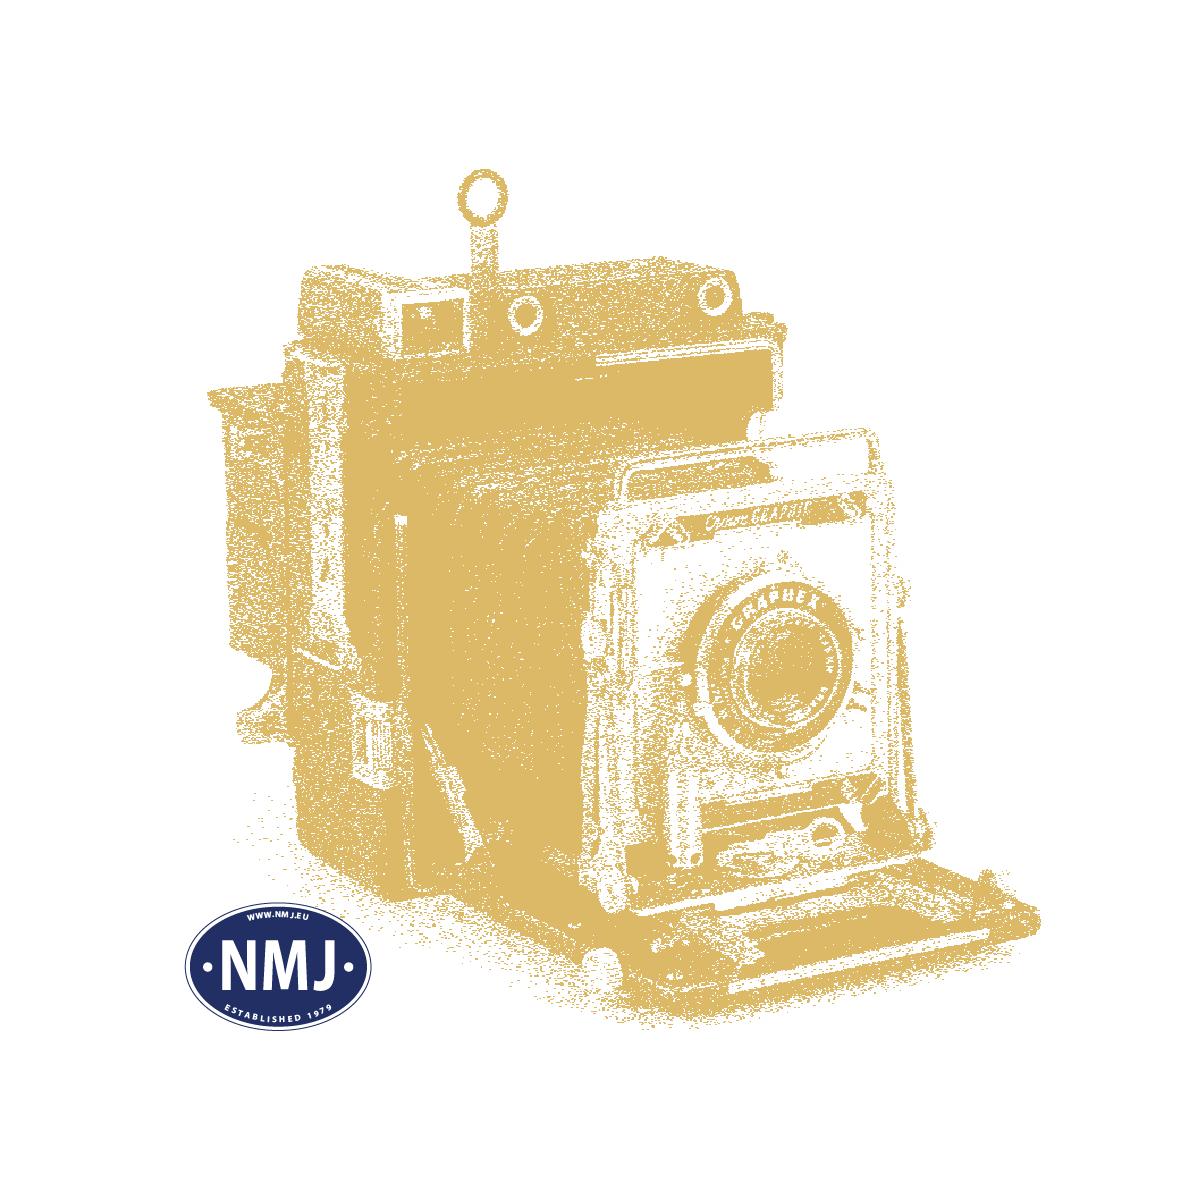 NMJT106.504 - NMJ Topline Personenwagen B3.25614 der NSB, rot/grau/silber